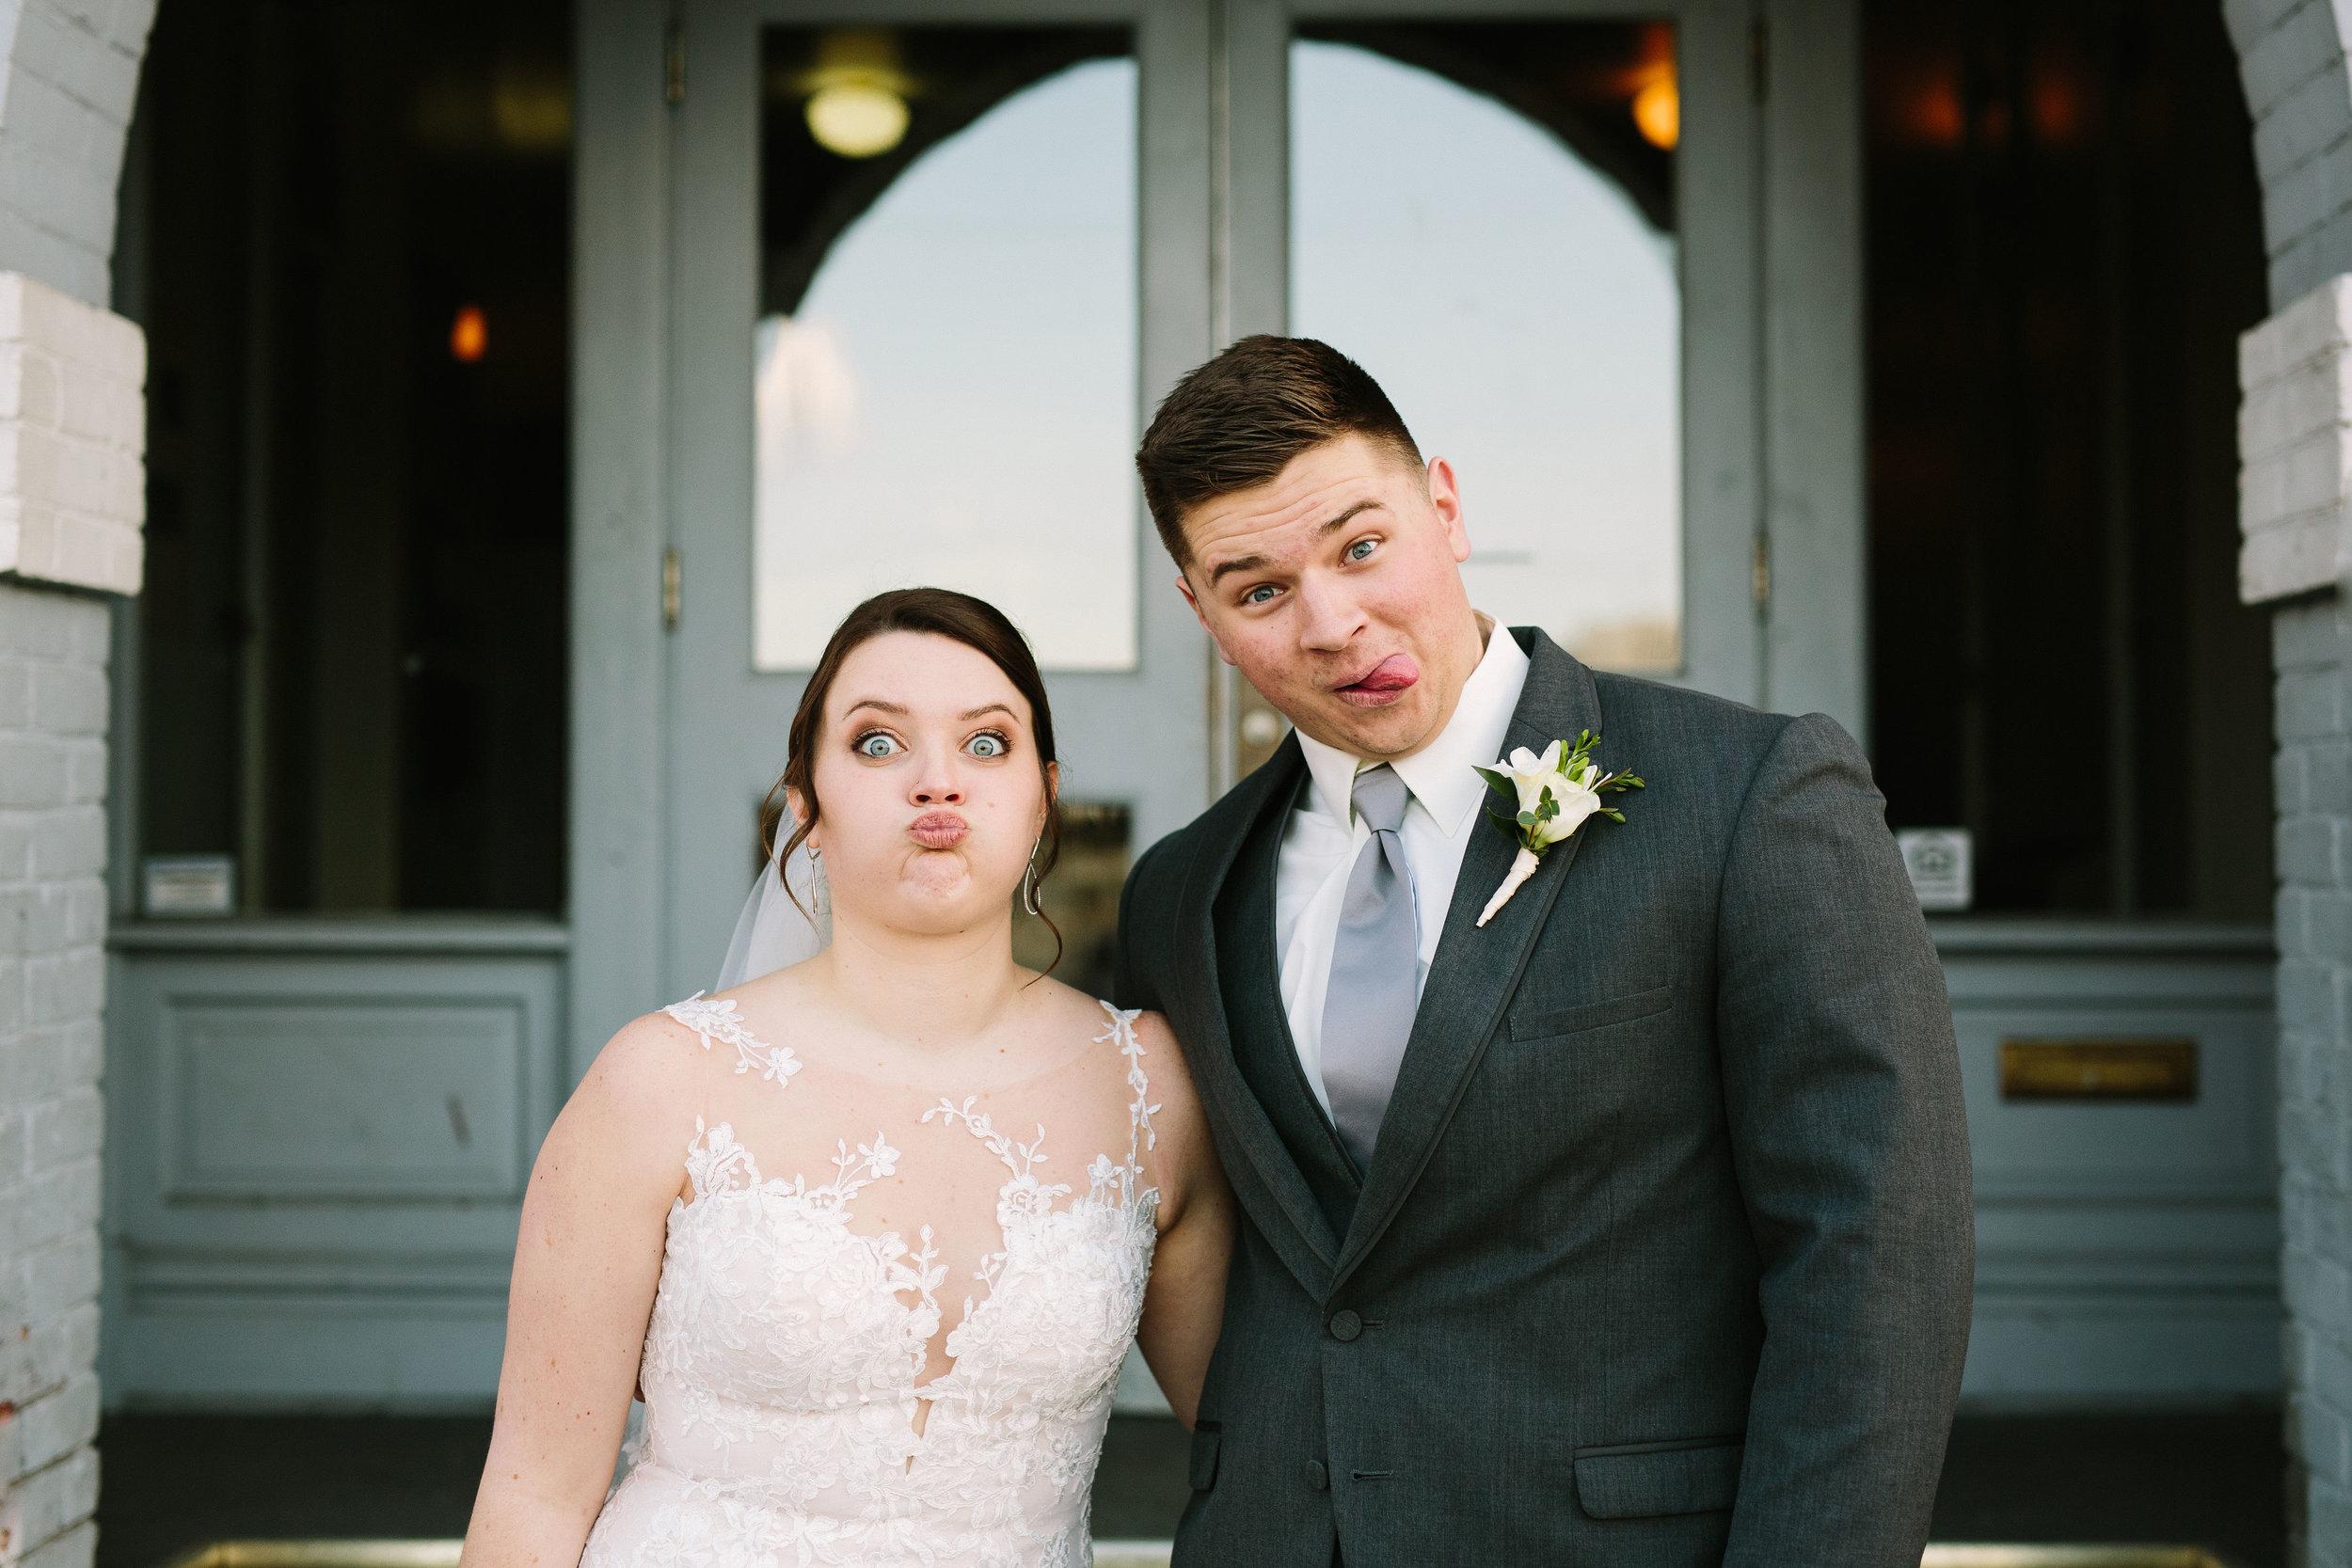 Fun Rustic spokane wedding close up duck lips funny face